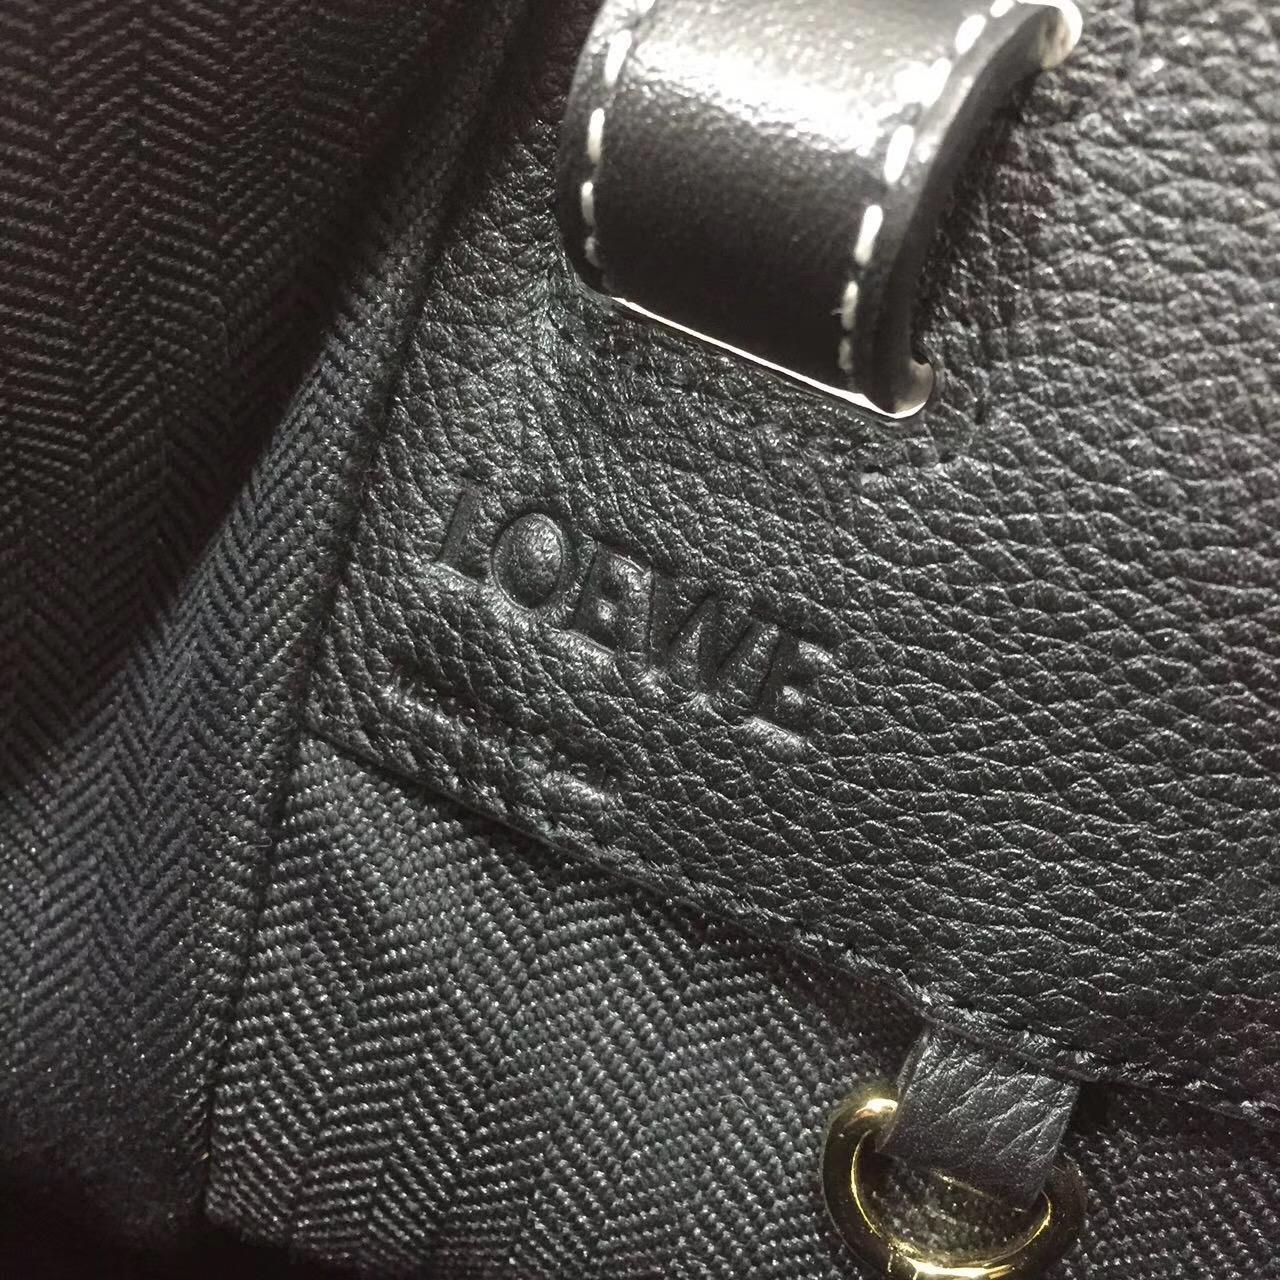 Loewe羅意威 Hammock Small Bag 顆粒小牛皮 黑色吊床包